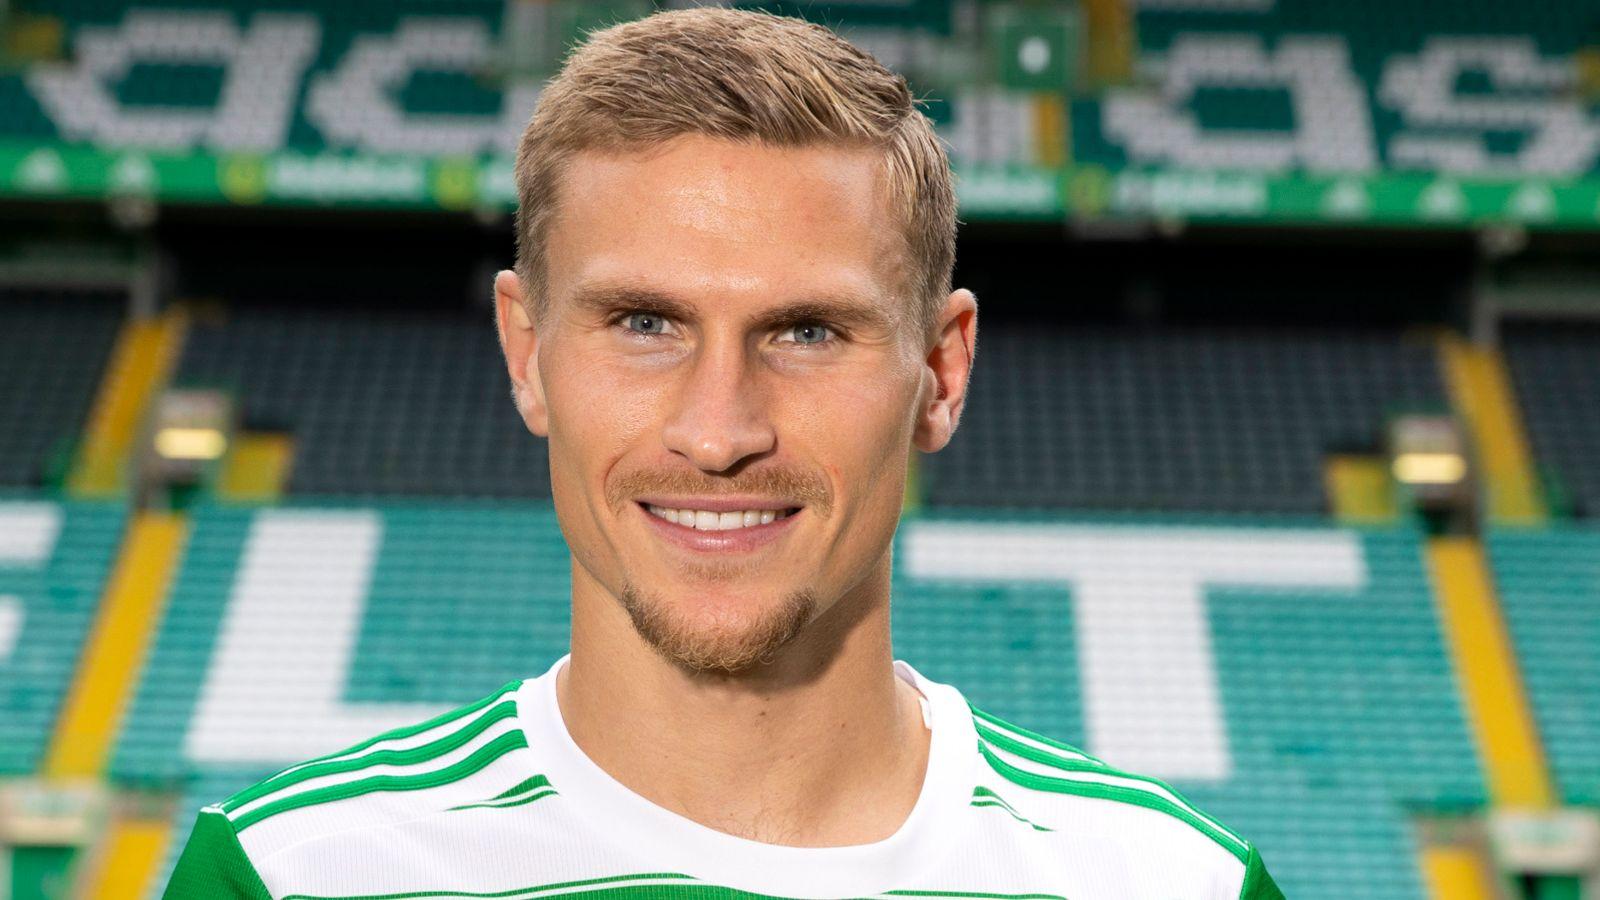 Ange Postecoglou says Celtic arrival Carl Starfelt is major boost to squad